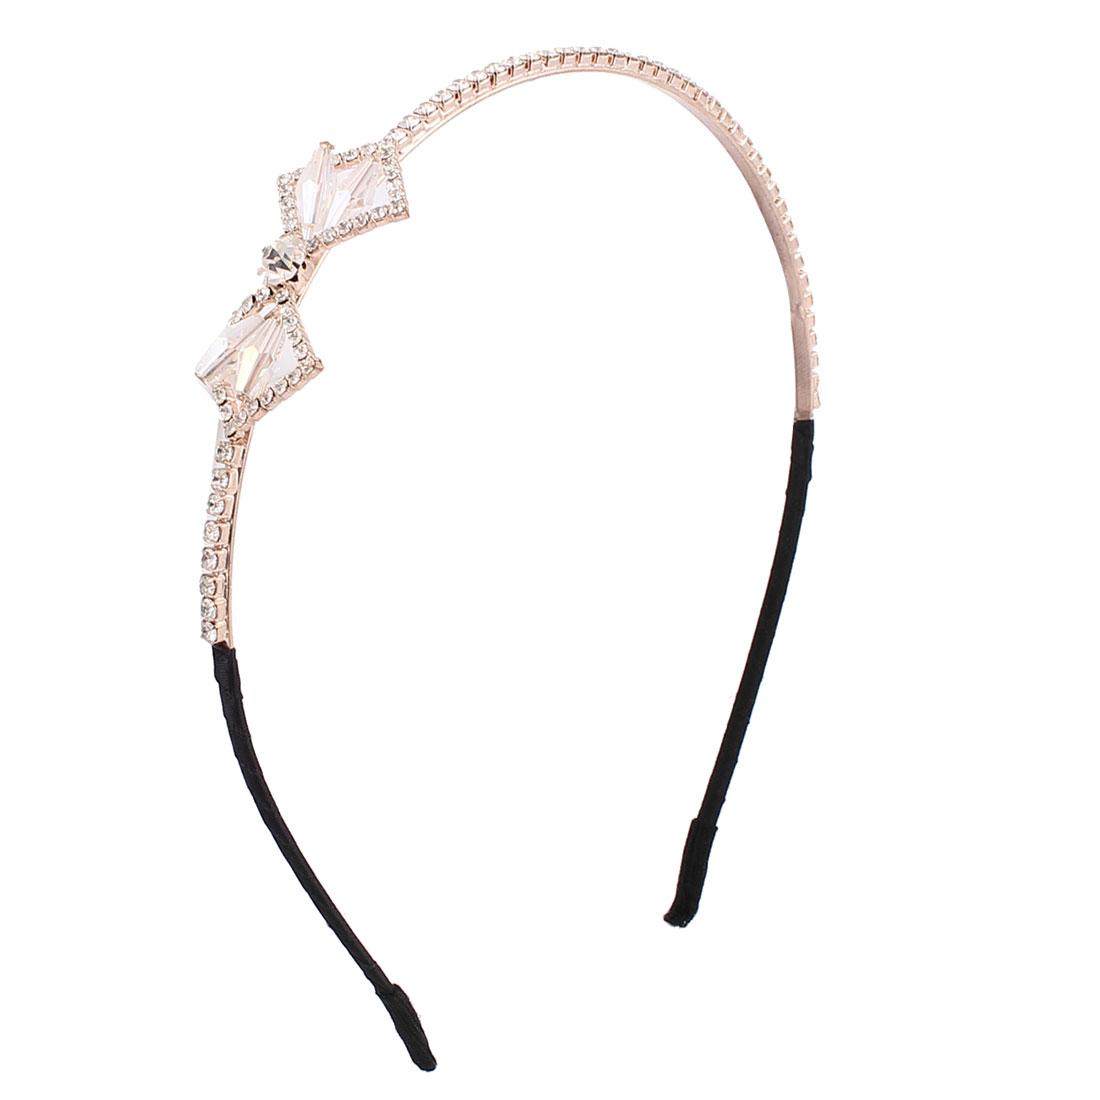 Lady Hairstyle Bowknot Decor Rhinestones Inlaid Metal Hair Hoop Headband Hairband Headdressing